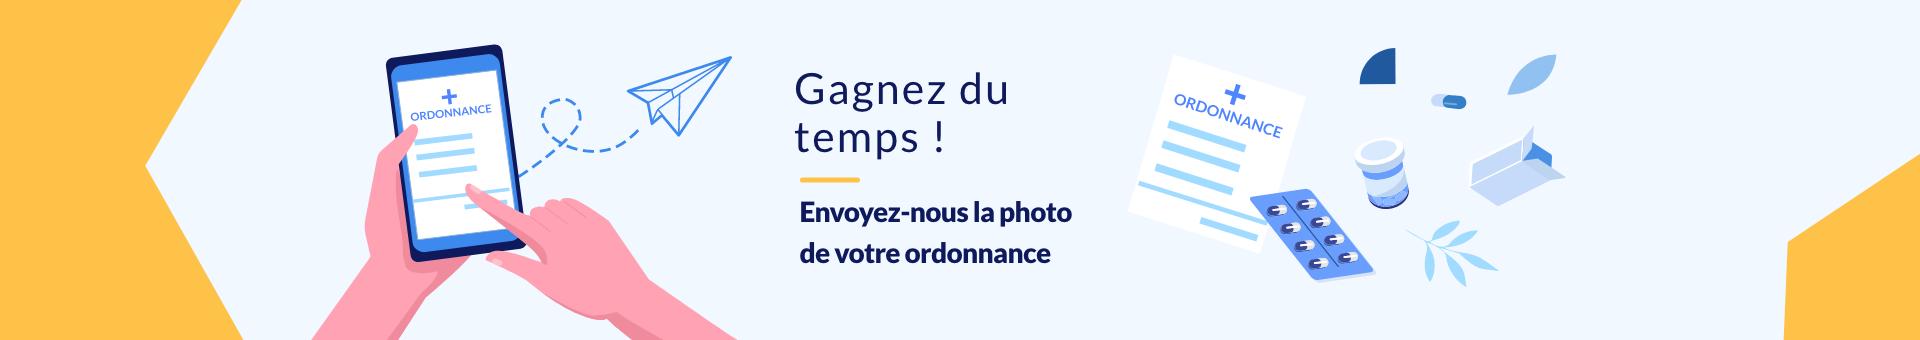 Pharmacie Saint Pierre,Gradignan